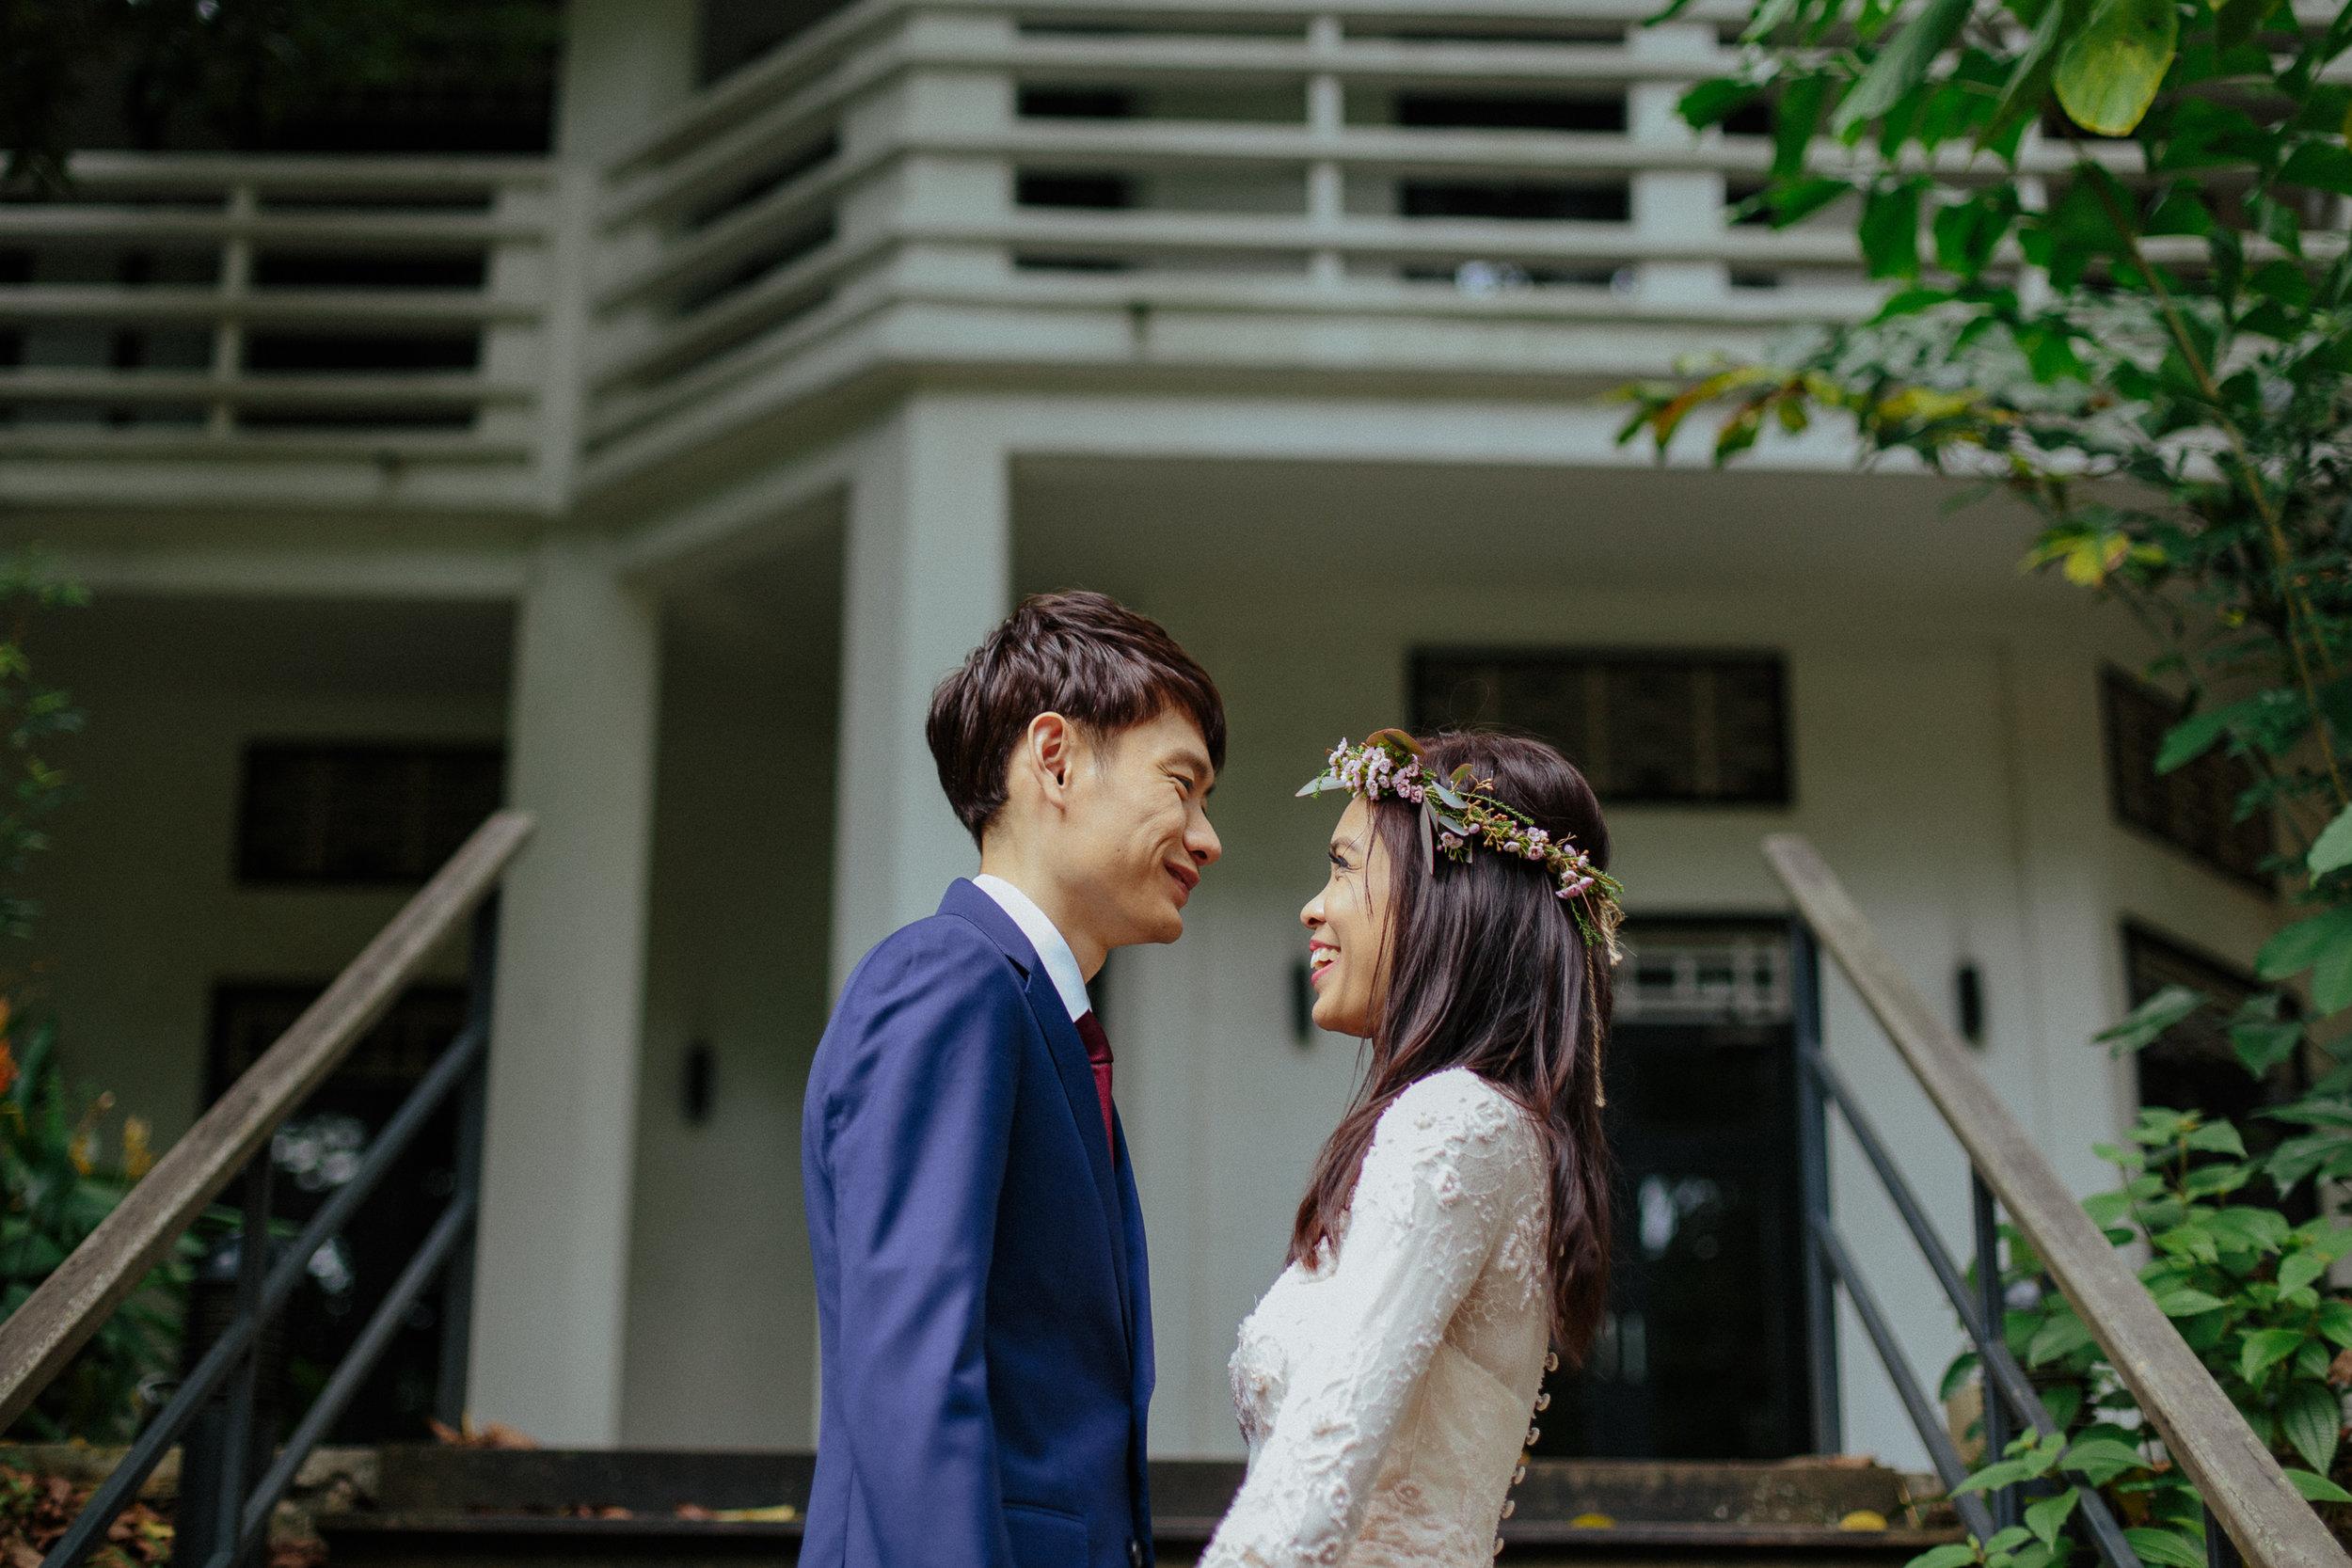 singapore-wedding-photographer-fadilah-kwan-076.jpg